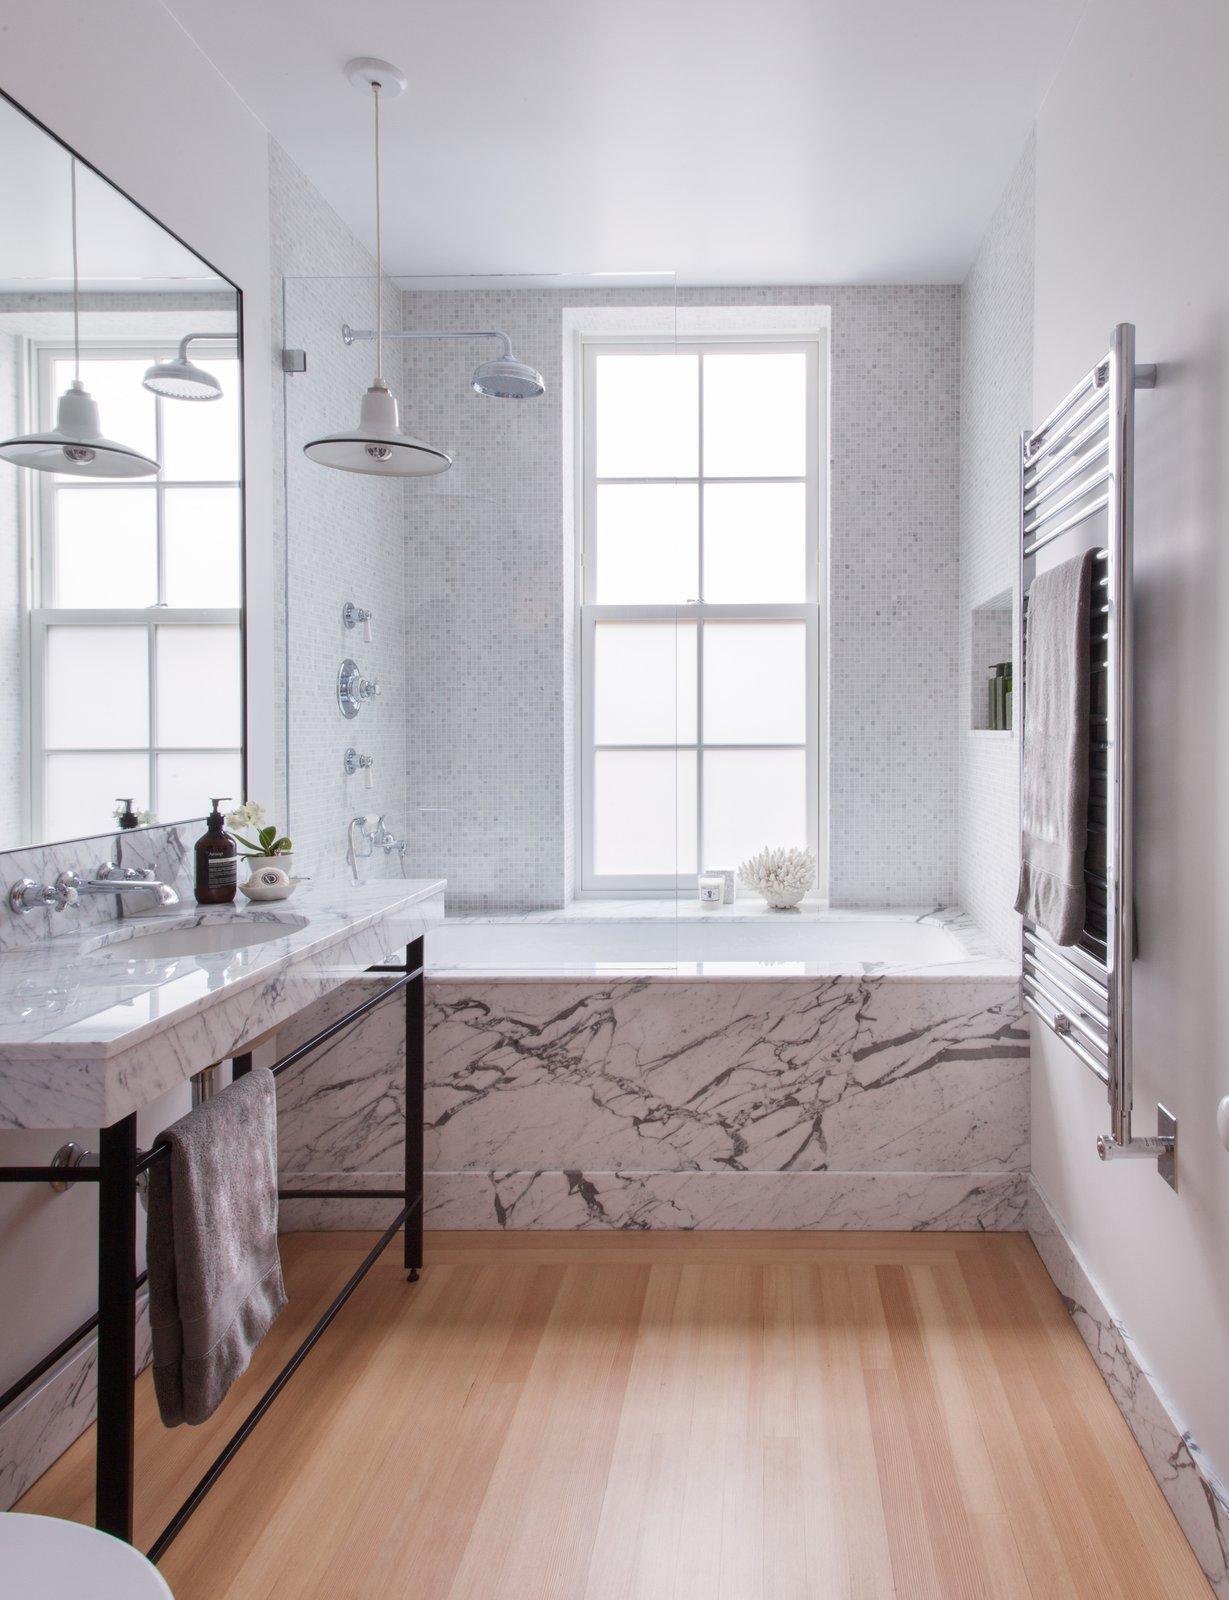 Bath Room, Marble Counter, Light Hardwood Floor, and Undermount Tub Clinton Hill Townhouse Renovation - Master Bath  Bathroom from Clinton Hill Townhouse